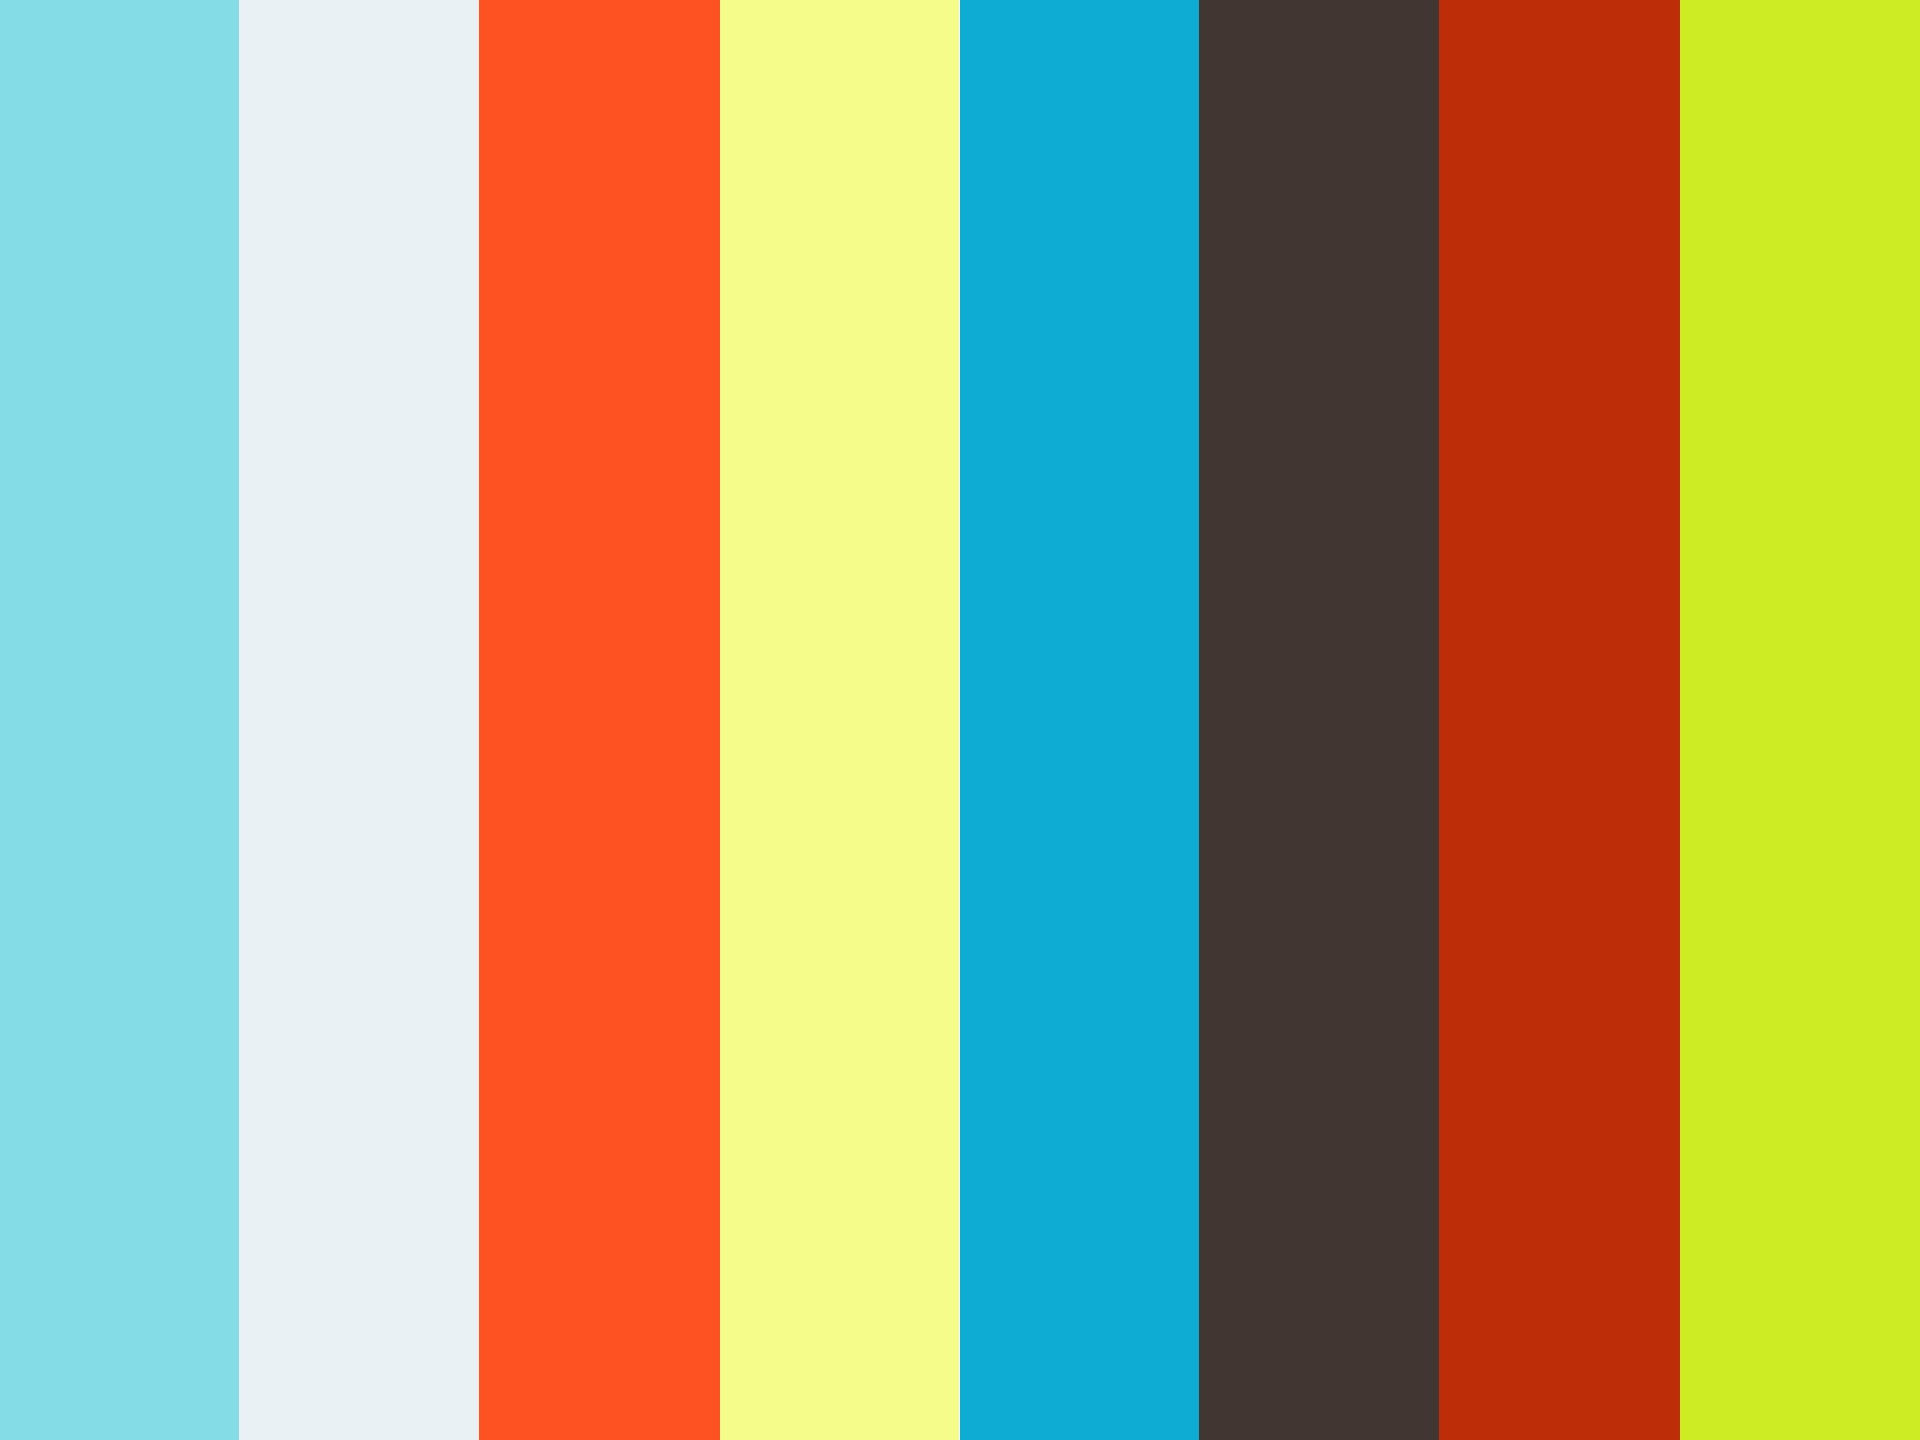 ubuntu netbook remix 9.10 espaol